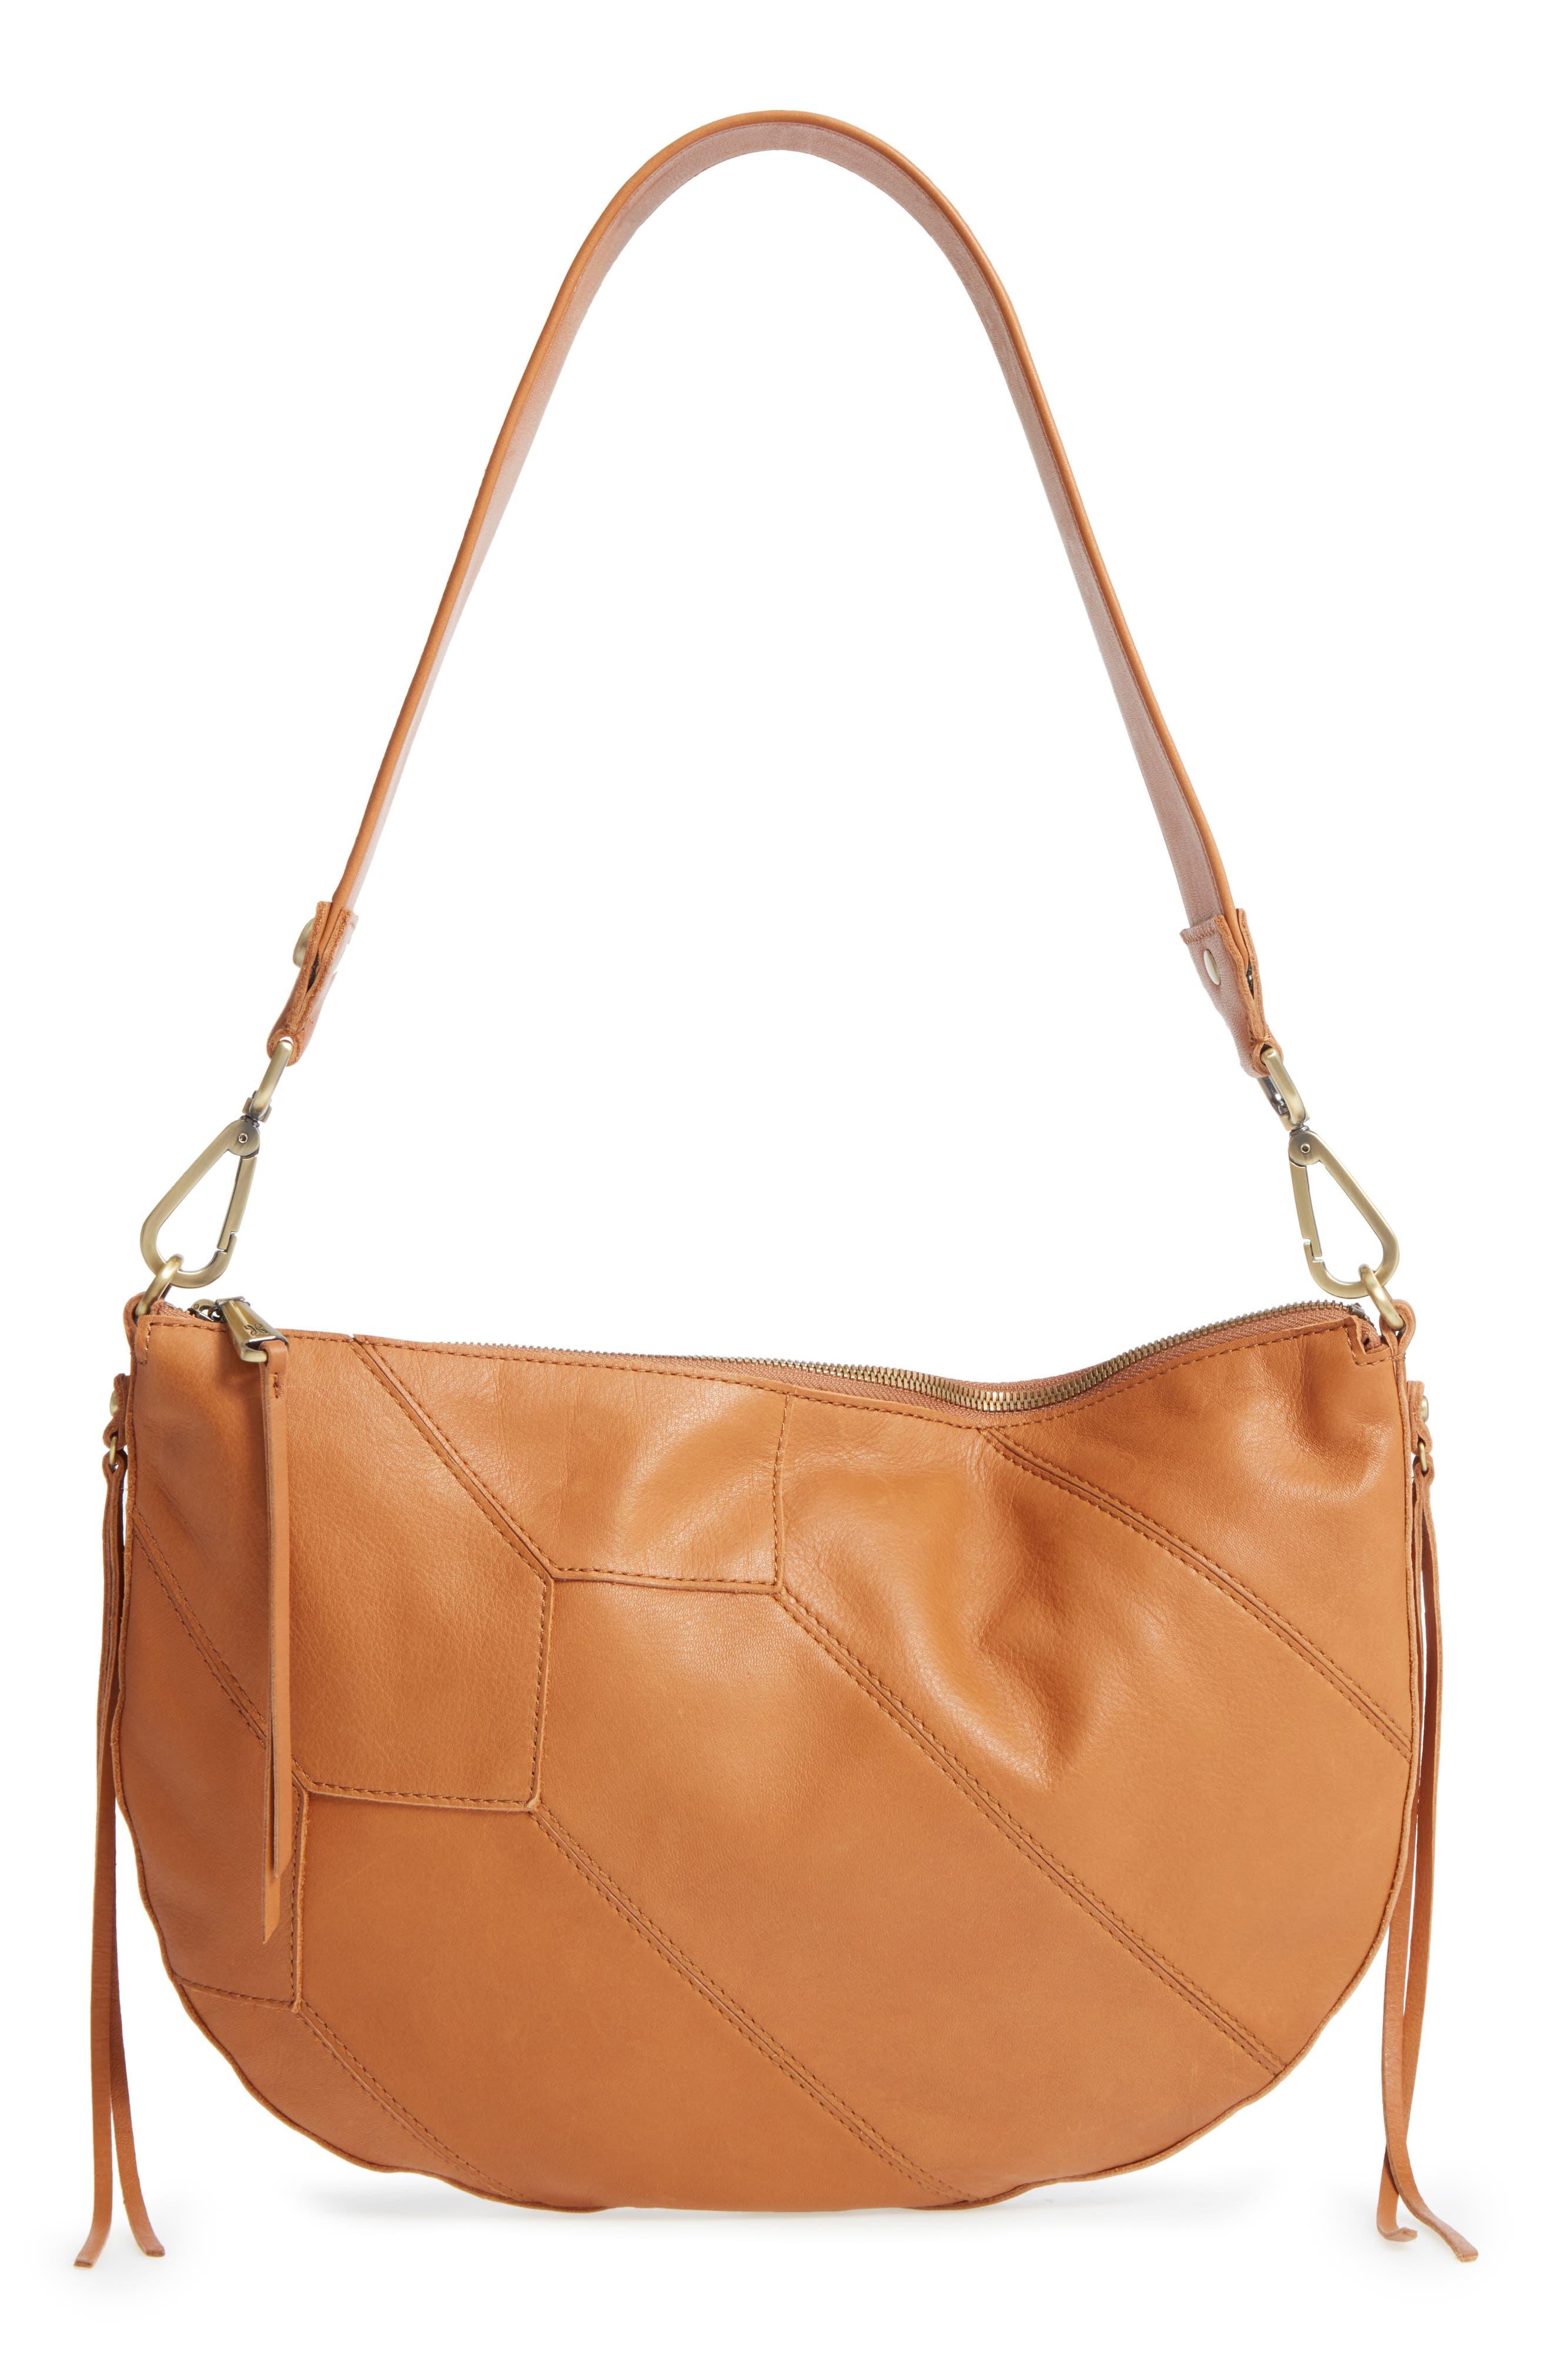 Hobo Cisco Calfskin Leather Hobo Bag